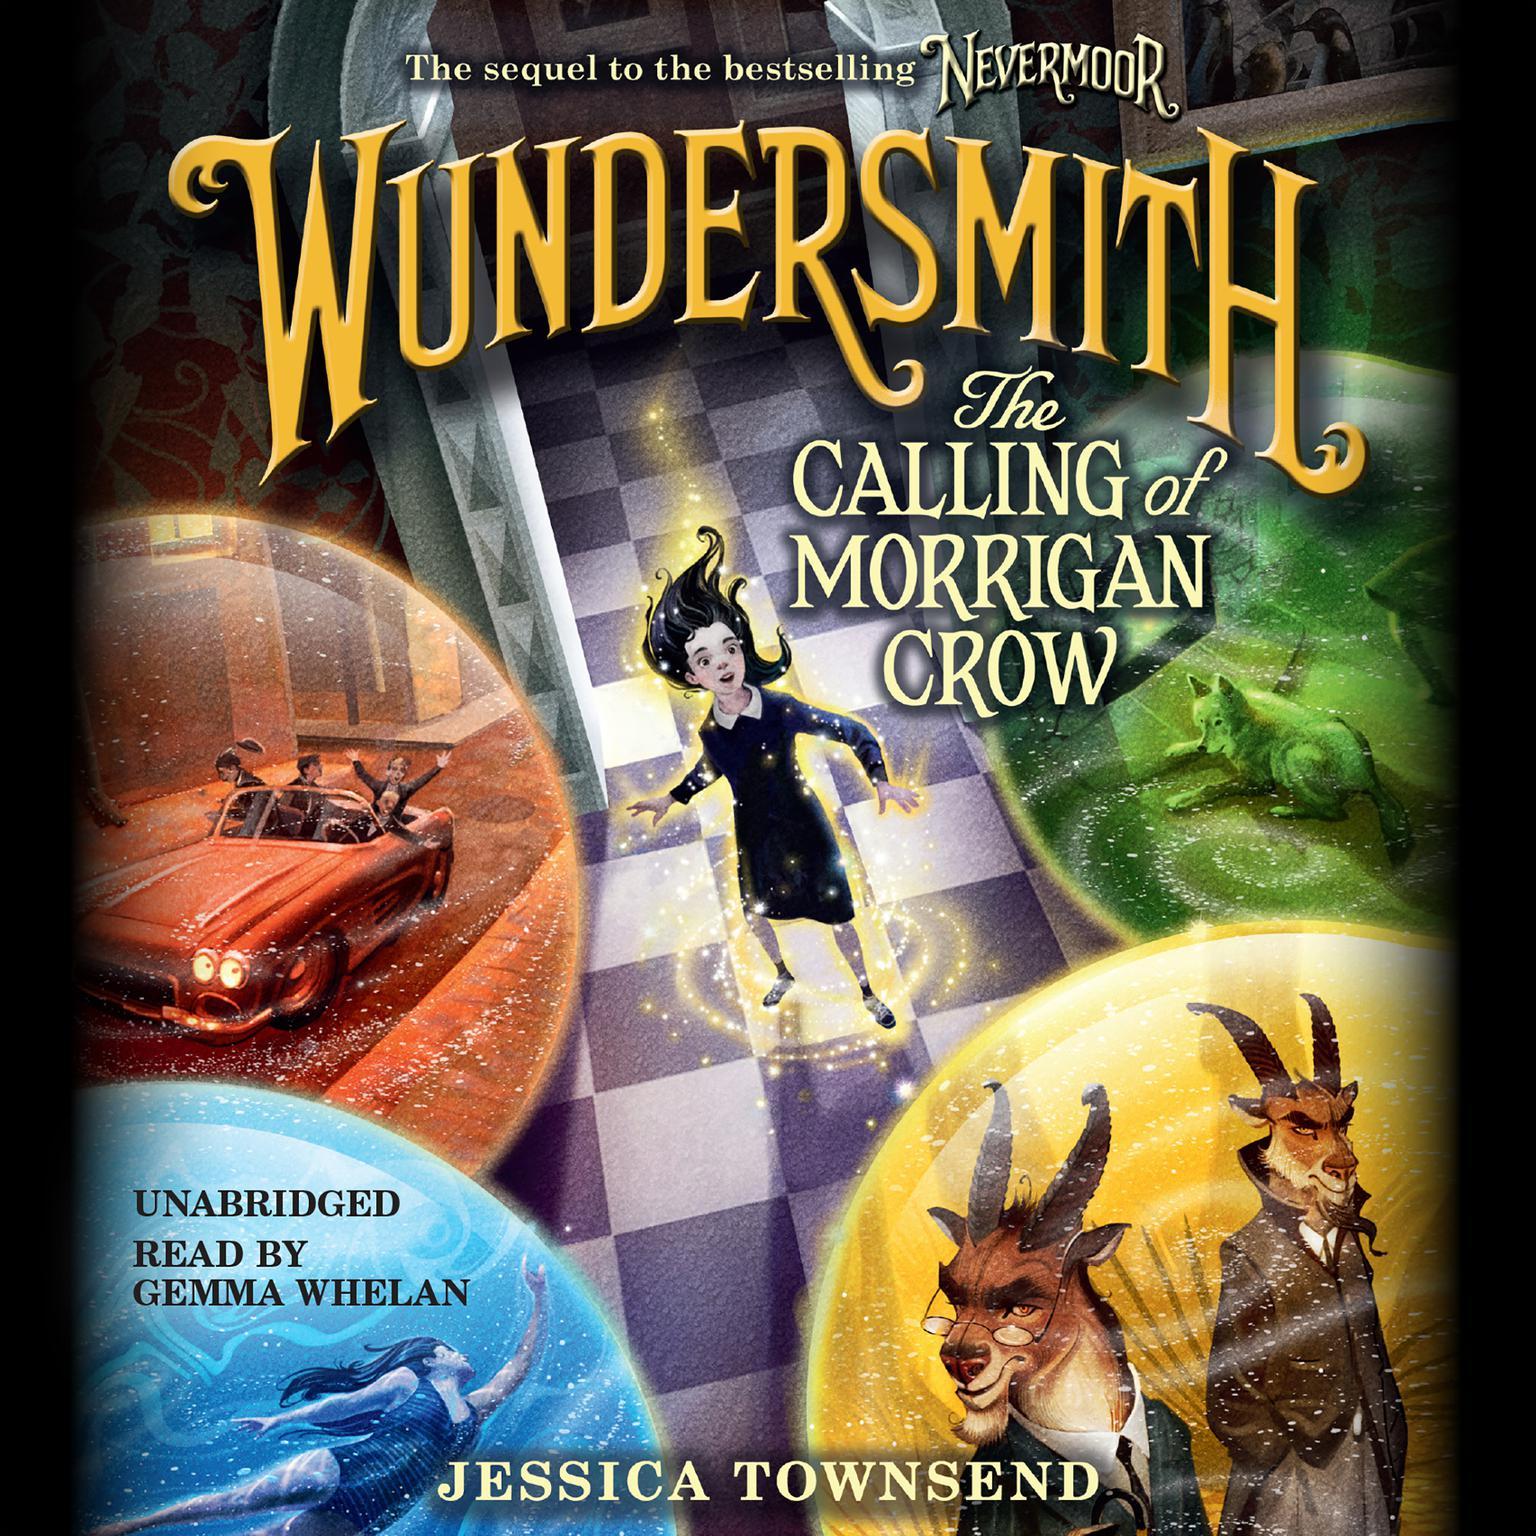 Printable Wundersmith: The Calling of Morrigan Crow Audiobook Cover Art